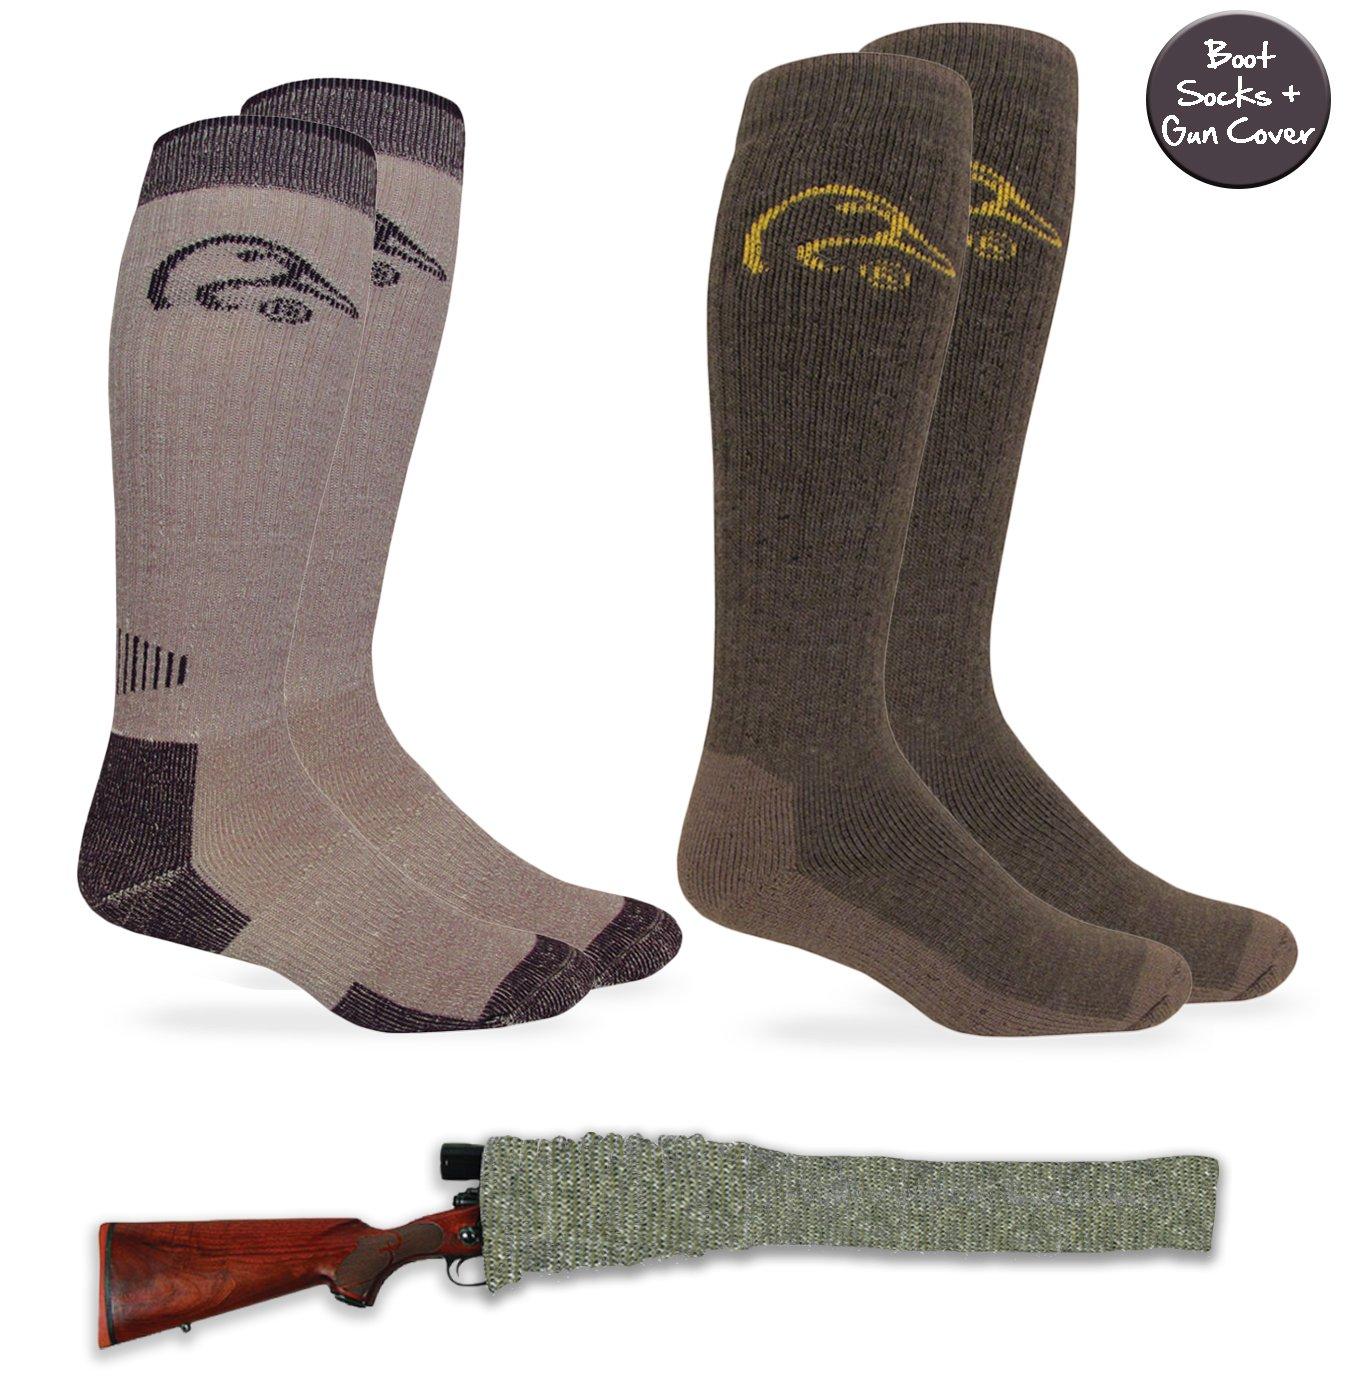 Ducks Unlimited Mens All Season Tall Camo Merino Wool Boot 2 Pair Socks + Silicone Gun Sock Cover Combo Pack (Large (10-13) - USA Shoe 9-13, Olive/Brown + Gun Sock)